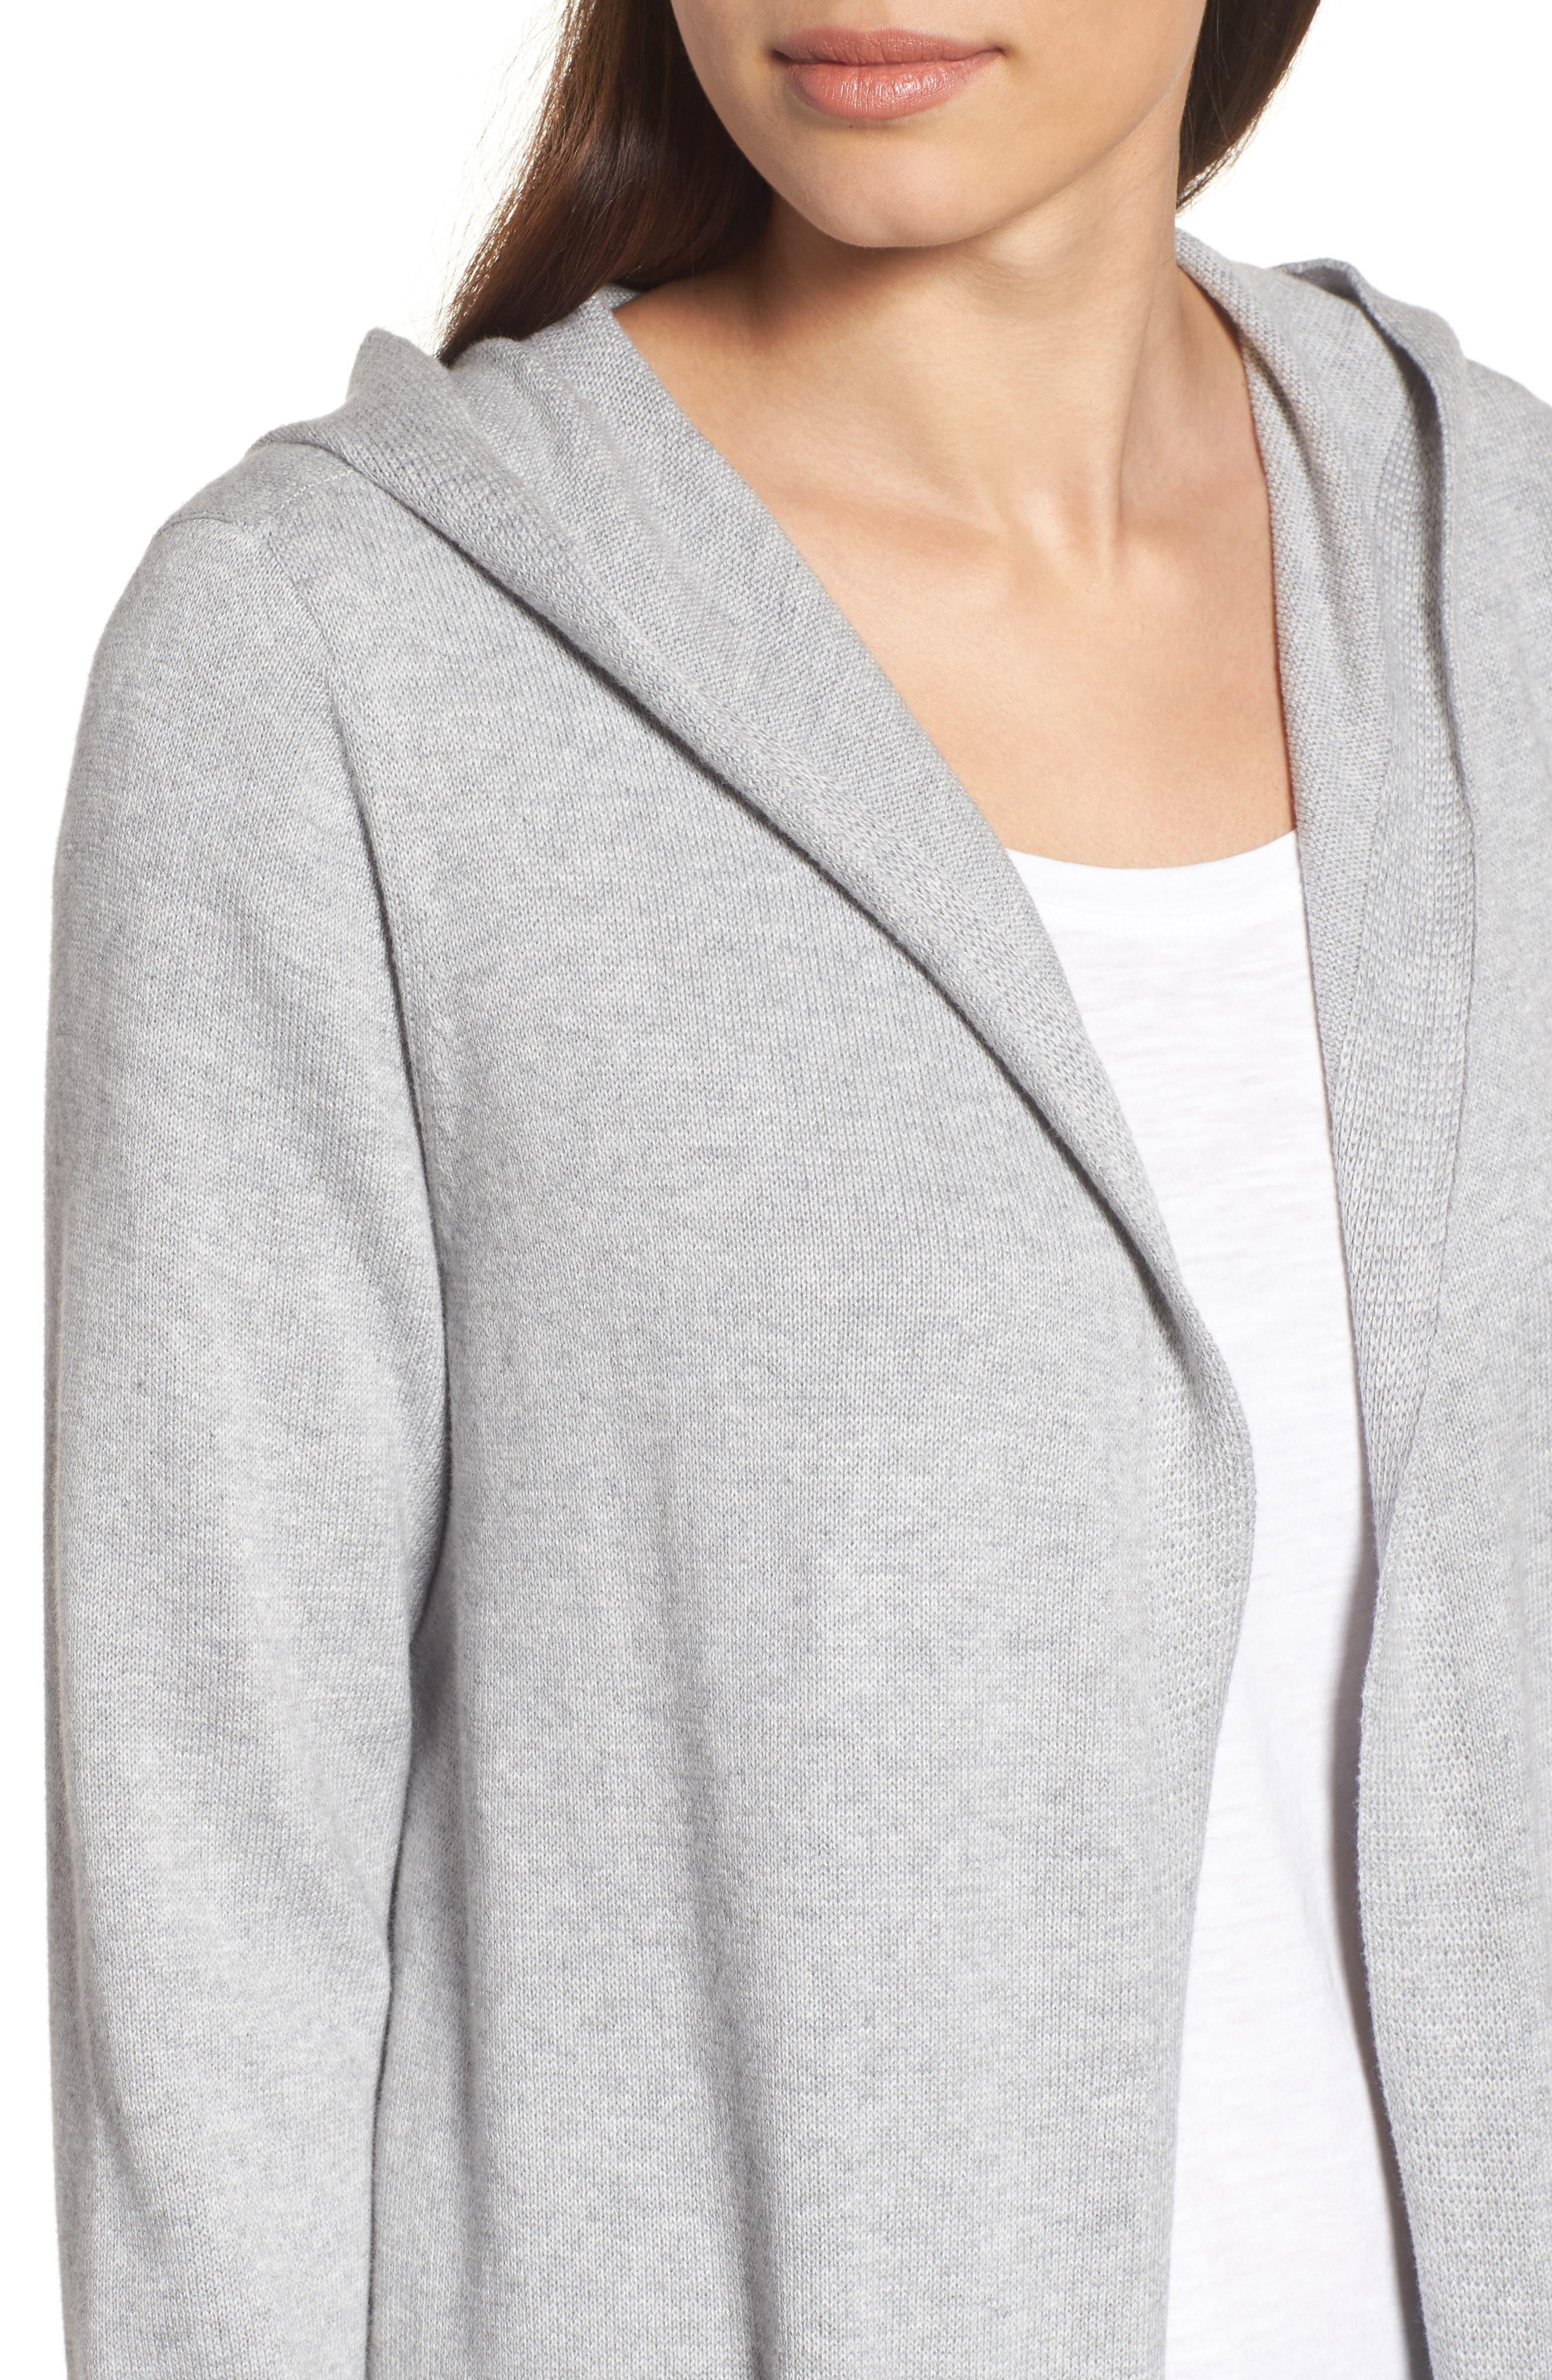 Organic Cotton Hooded Cardigan,                             Alternate thumbnail 4, color,                             022